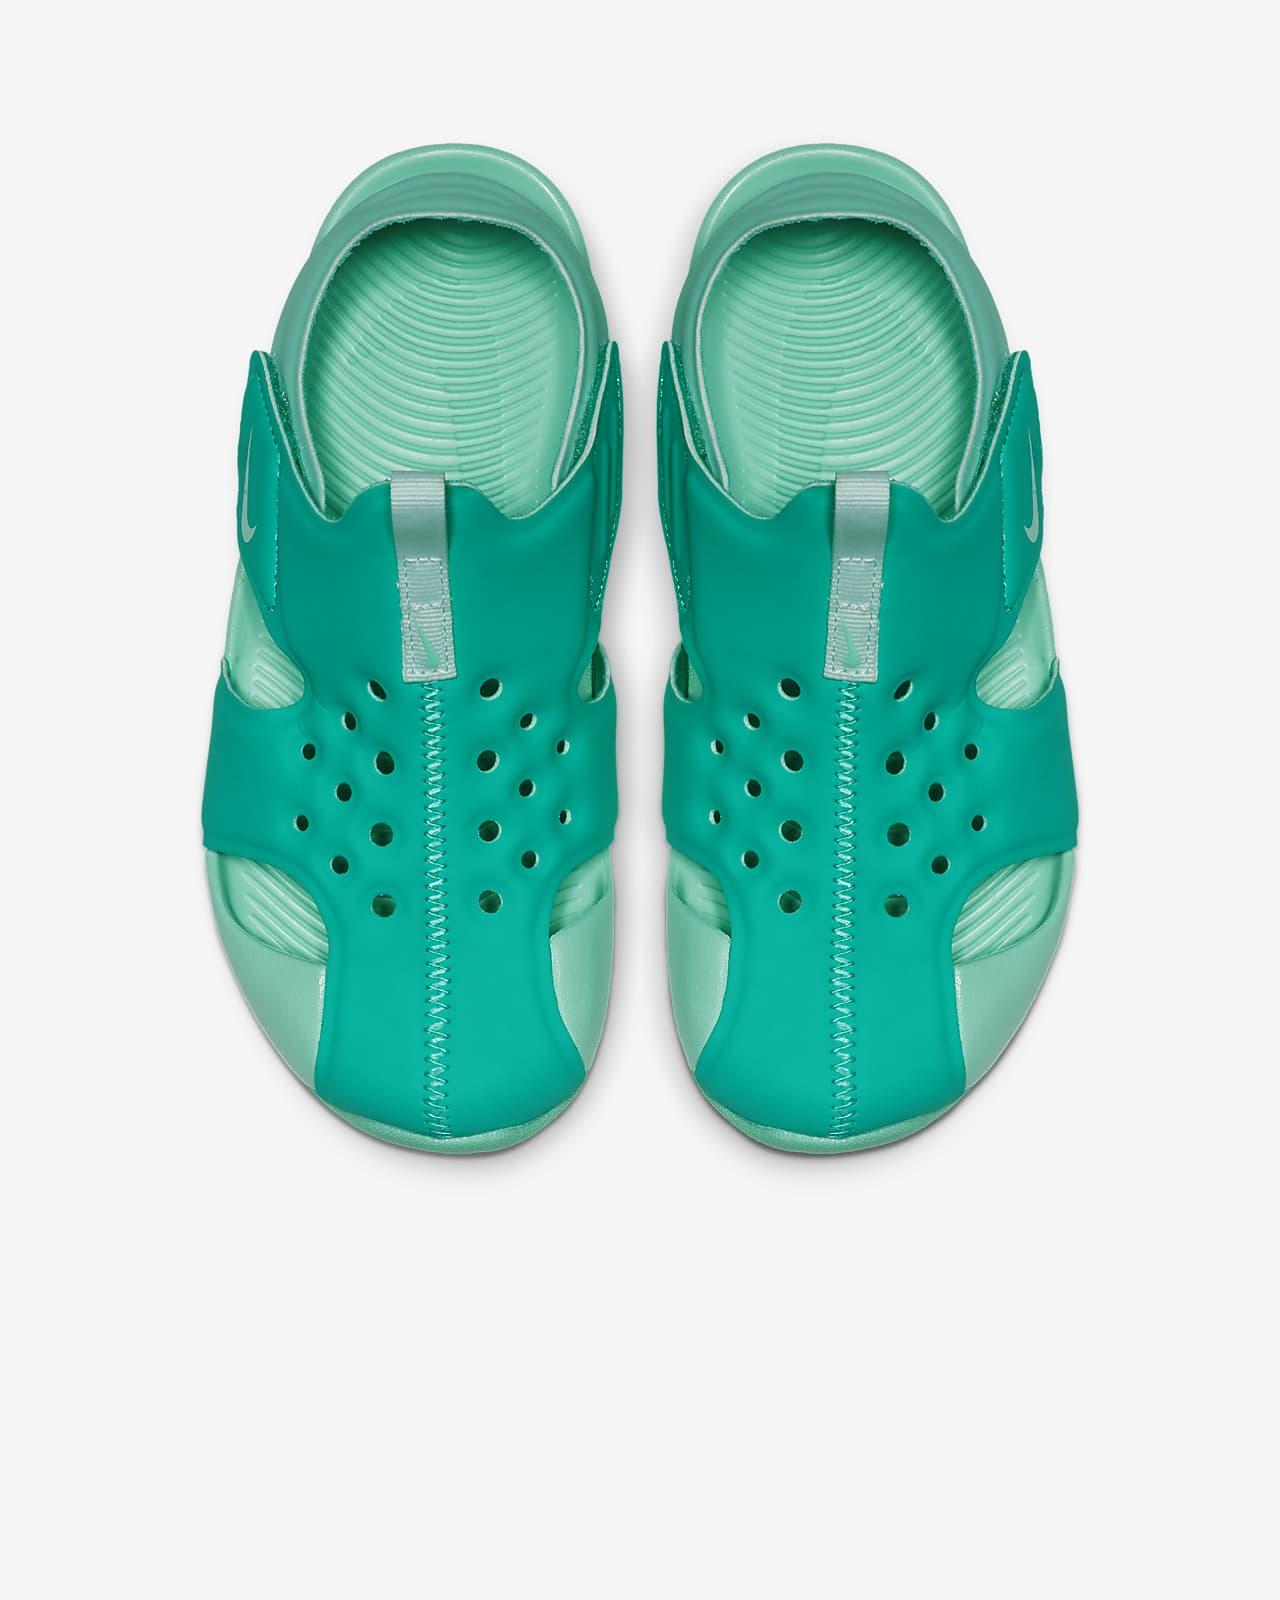 buy \u003e nike sunray protect size 4, Up to